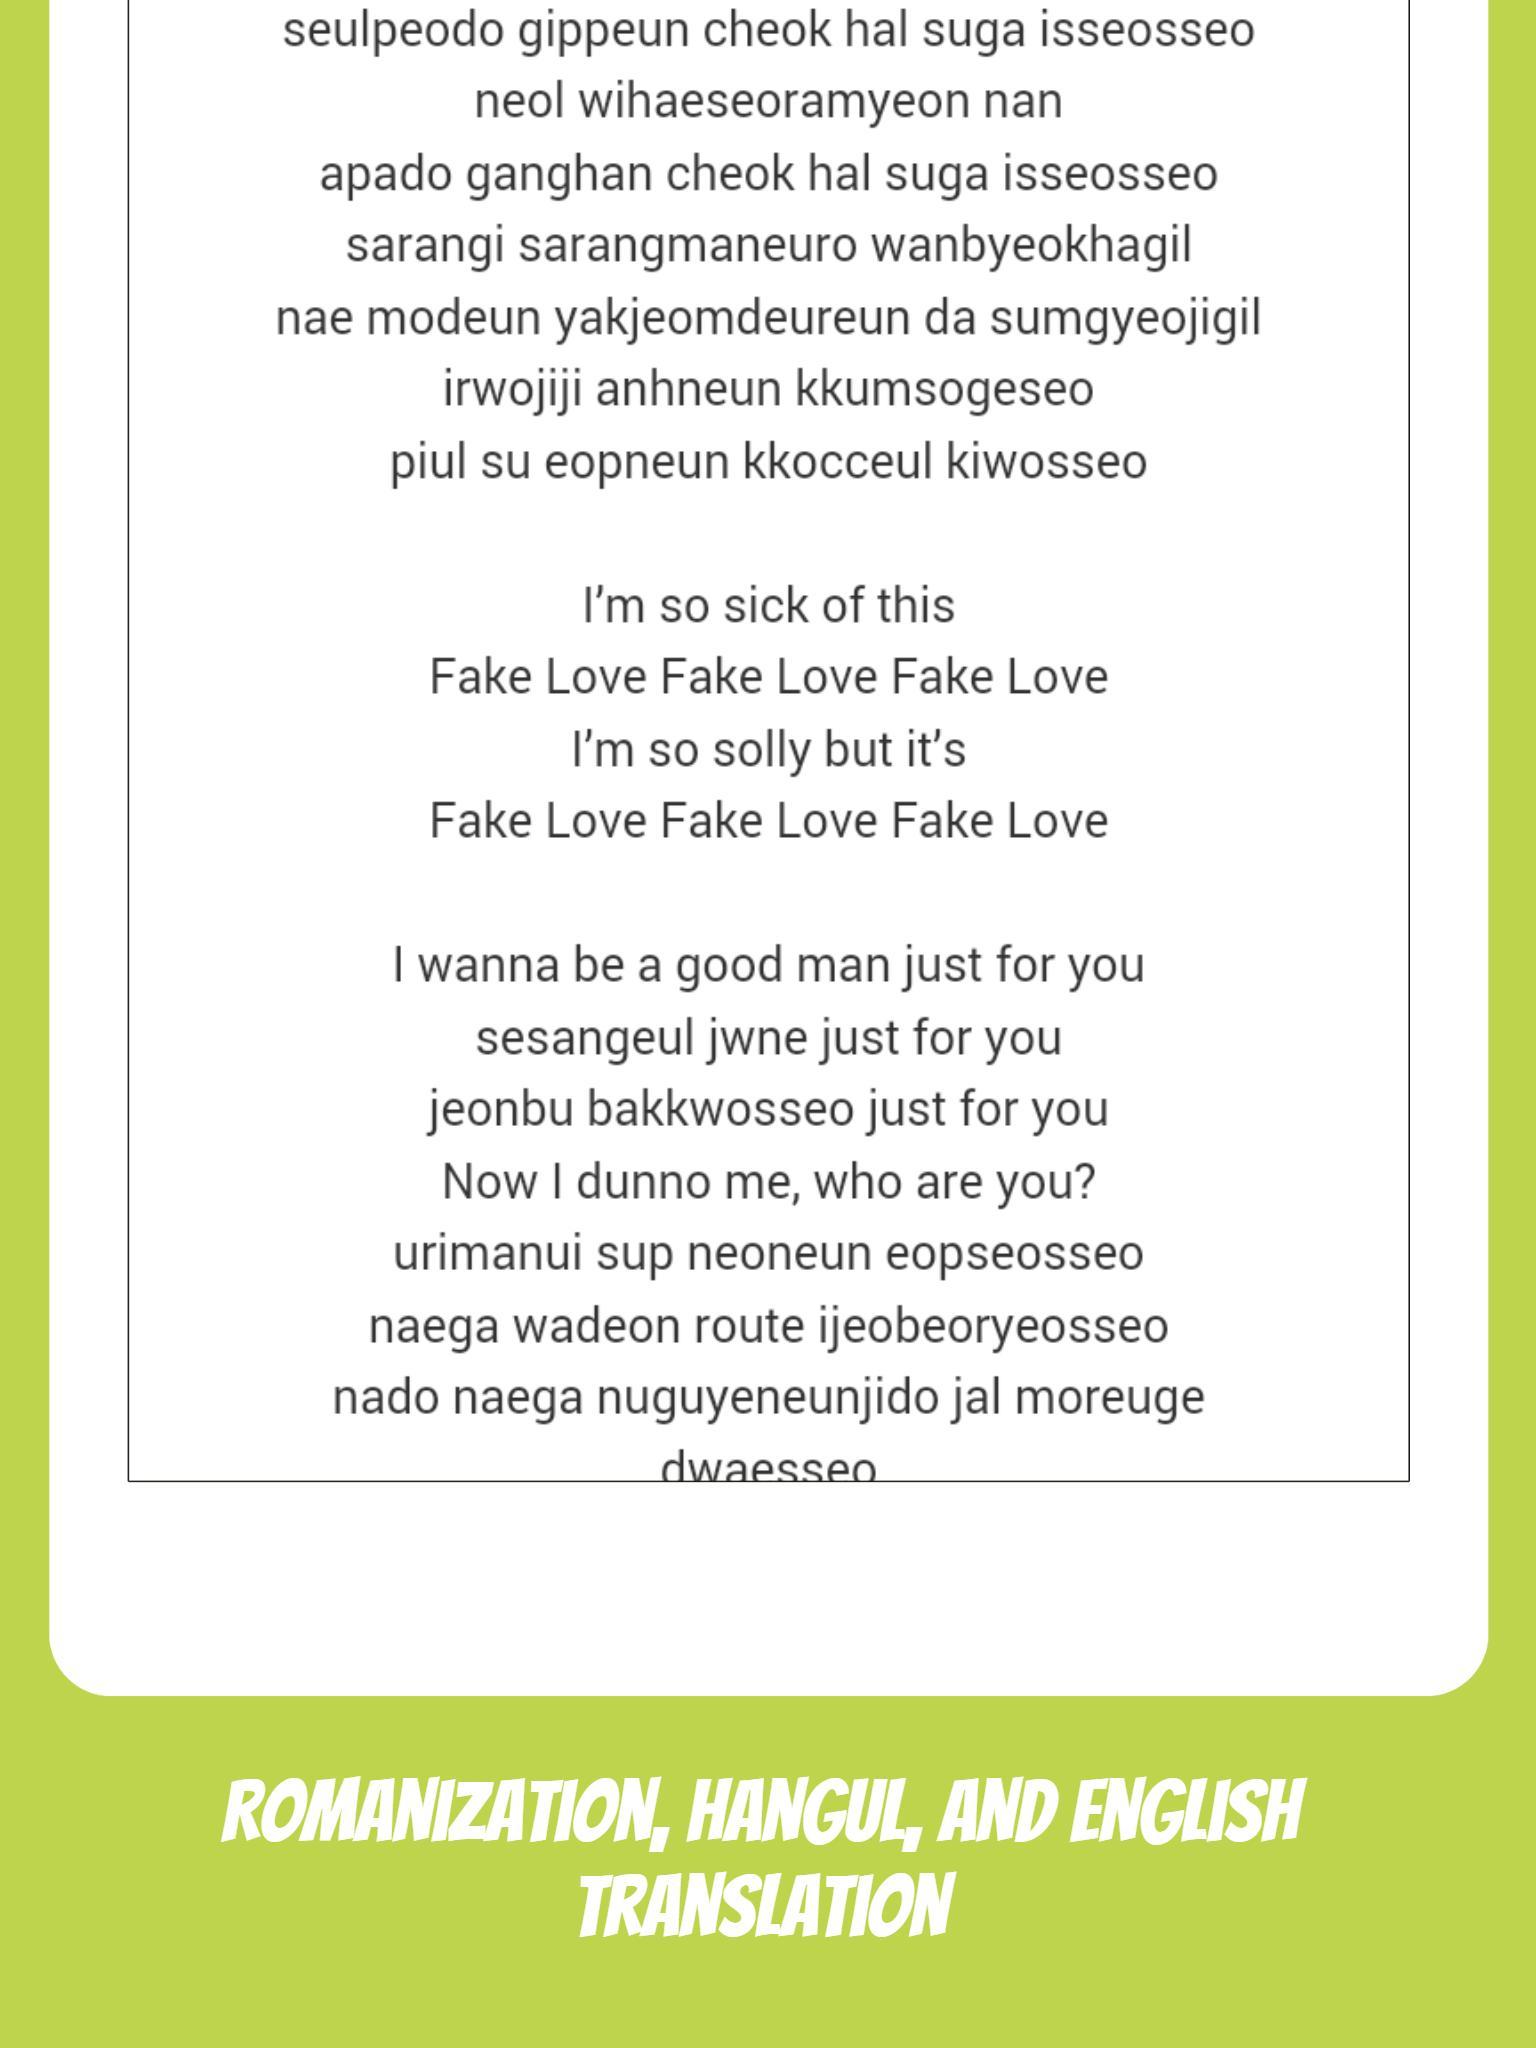 BTS Lyrics & Wallpapers (No Ads & Offline) for Android - APK